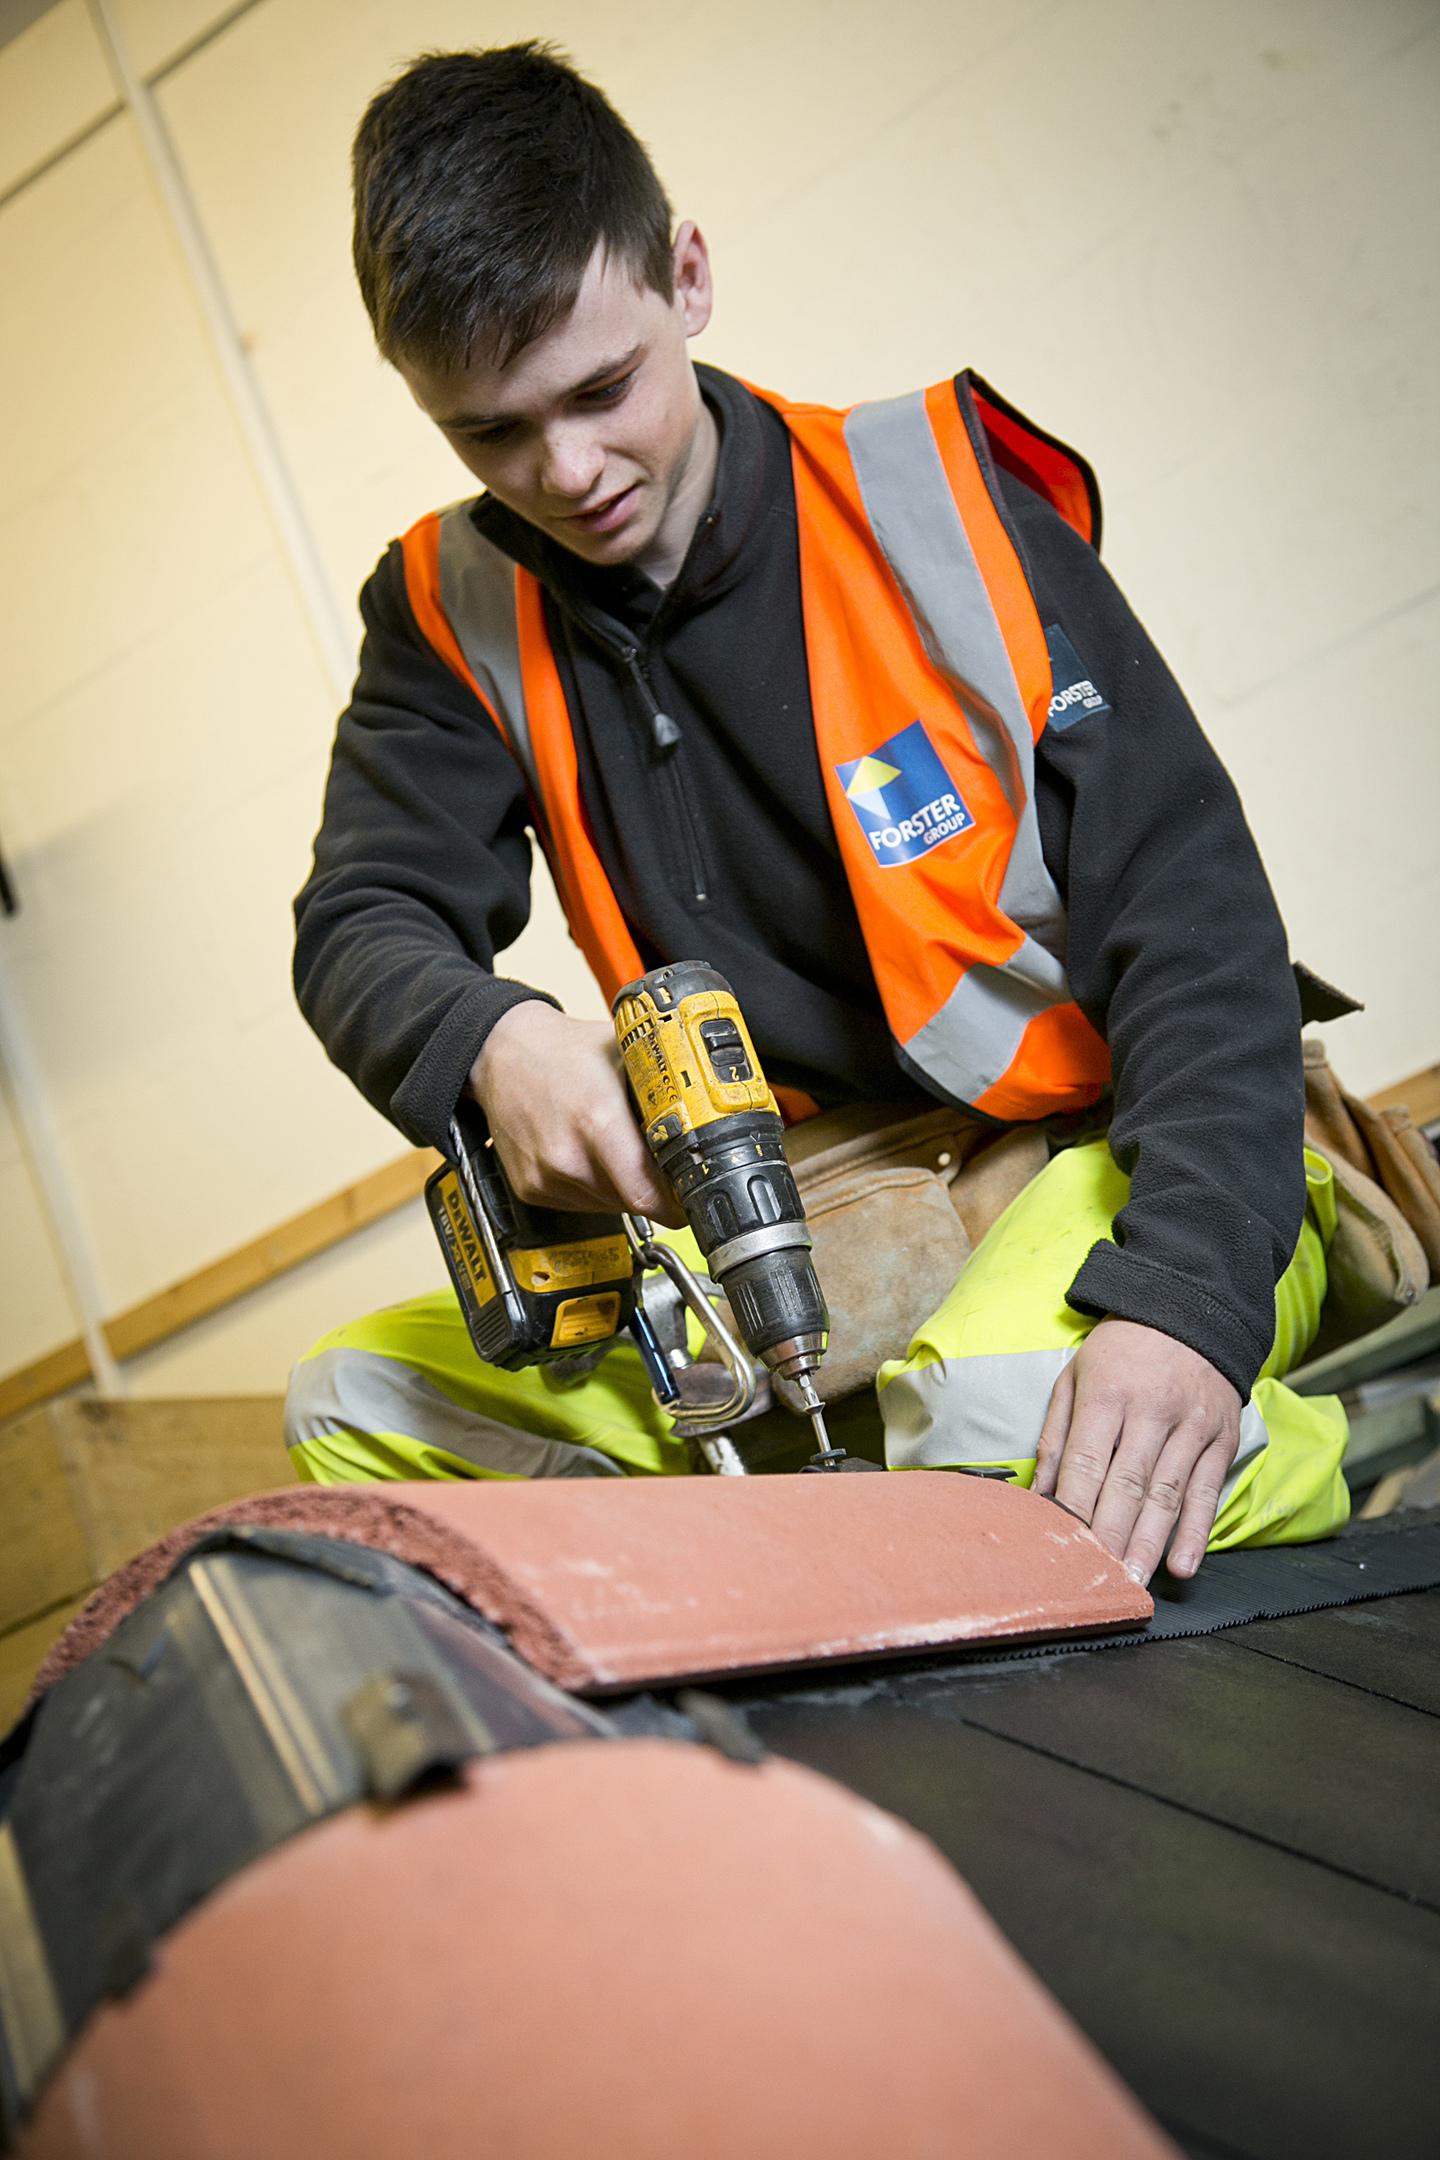 Apprentice Jordan Boyle fixing a ridge tile in Forster's Skills Academy